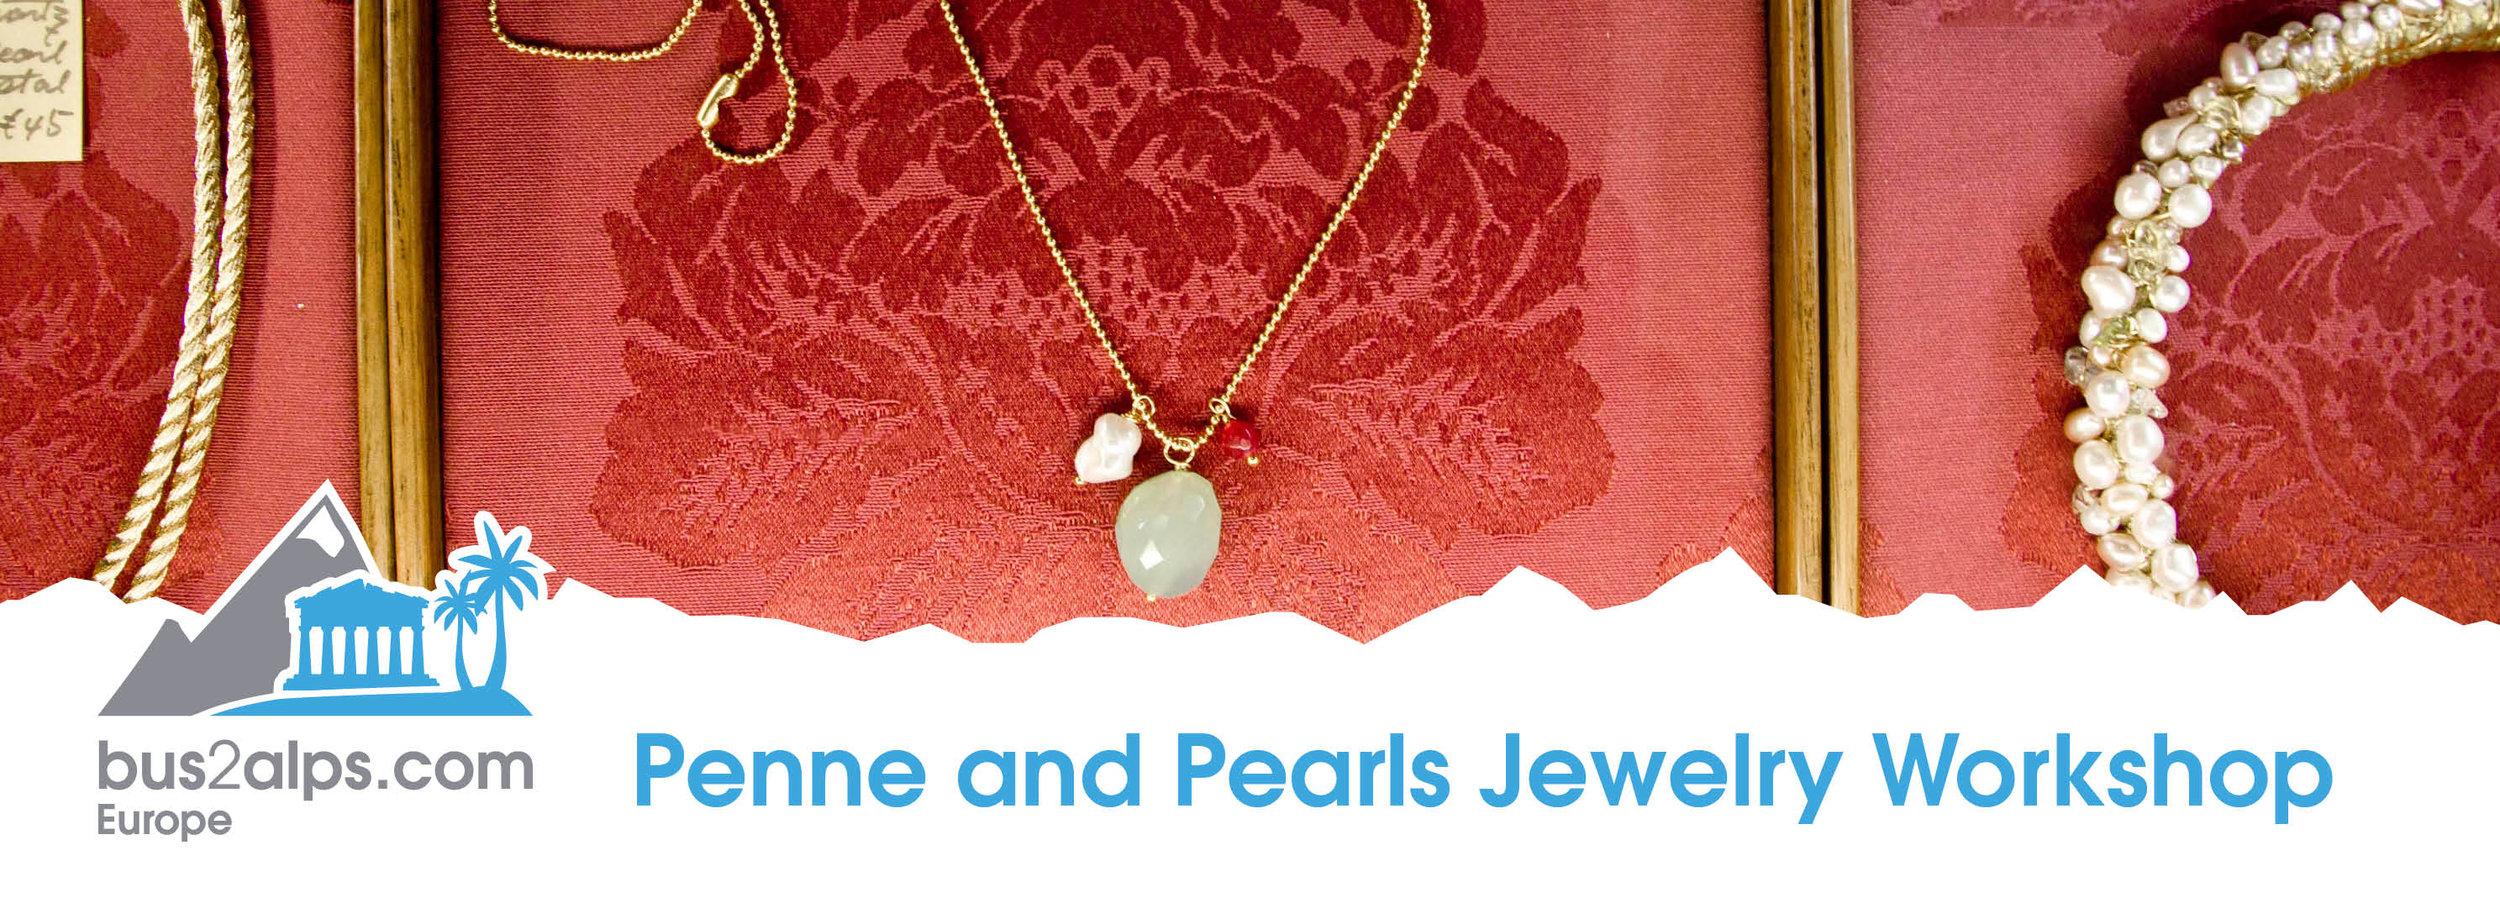 jewelry_workshop_banner.jpg